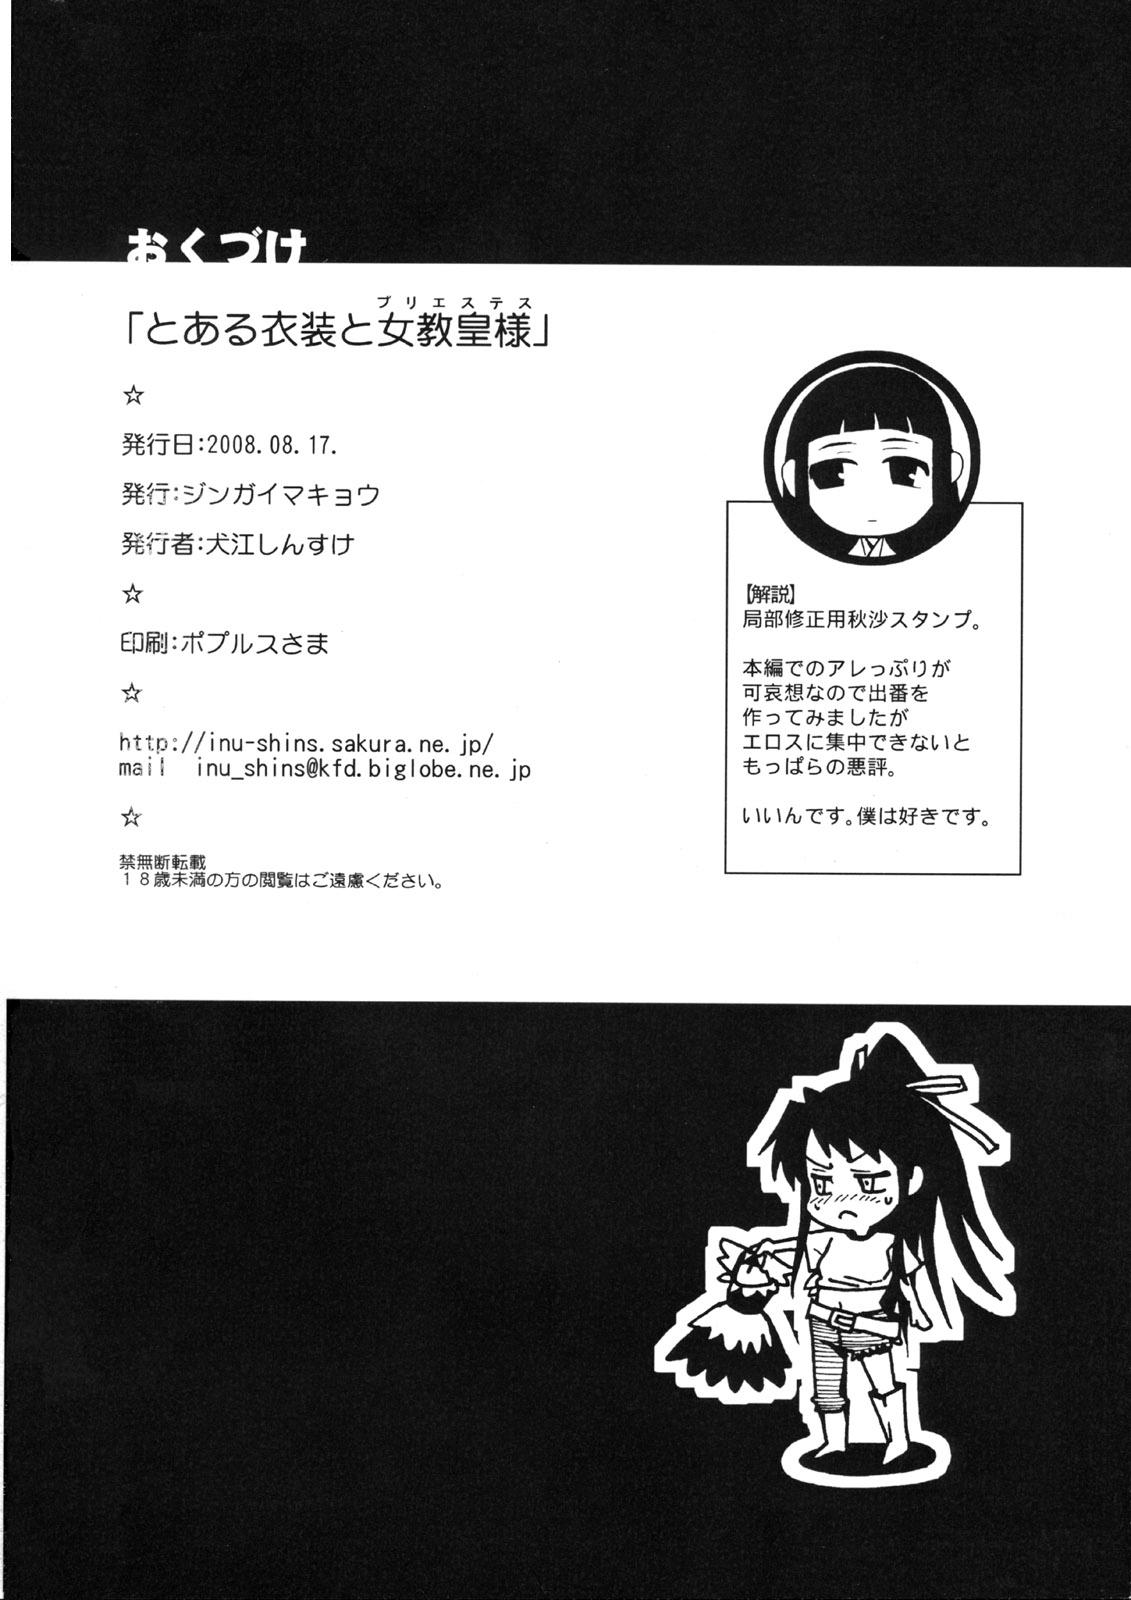 to koushi akashic majutsu records rokudenashi Protip shoot the cyberdemon until it dies